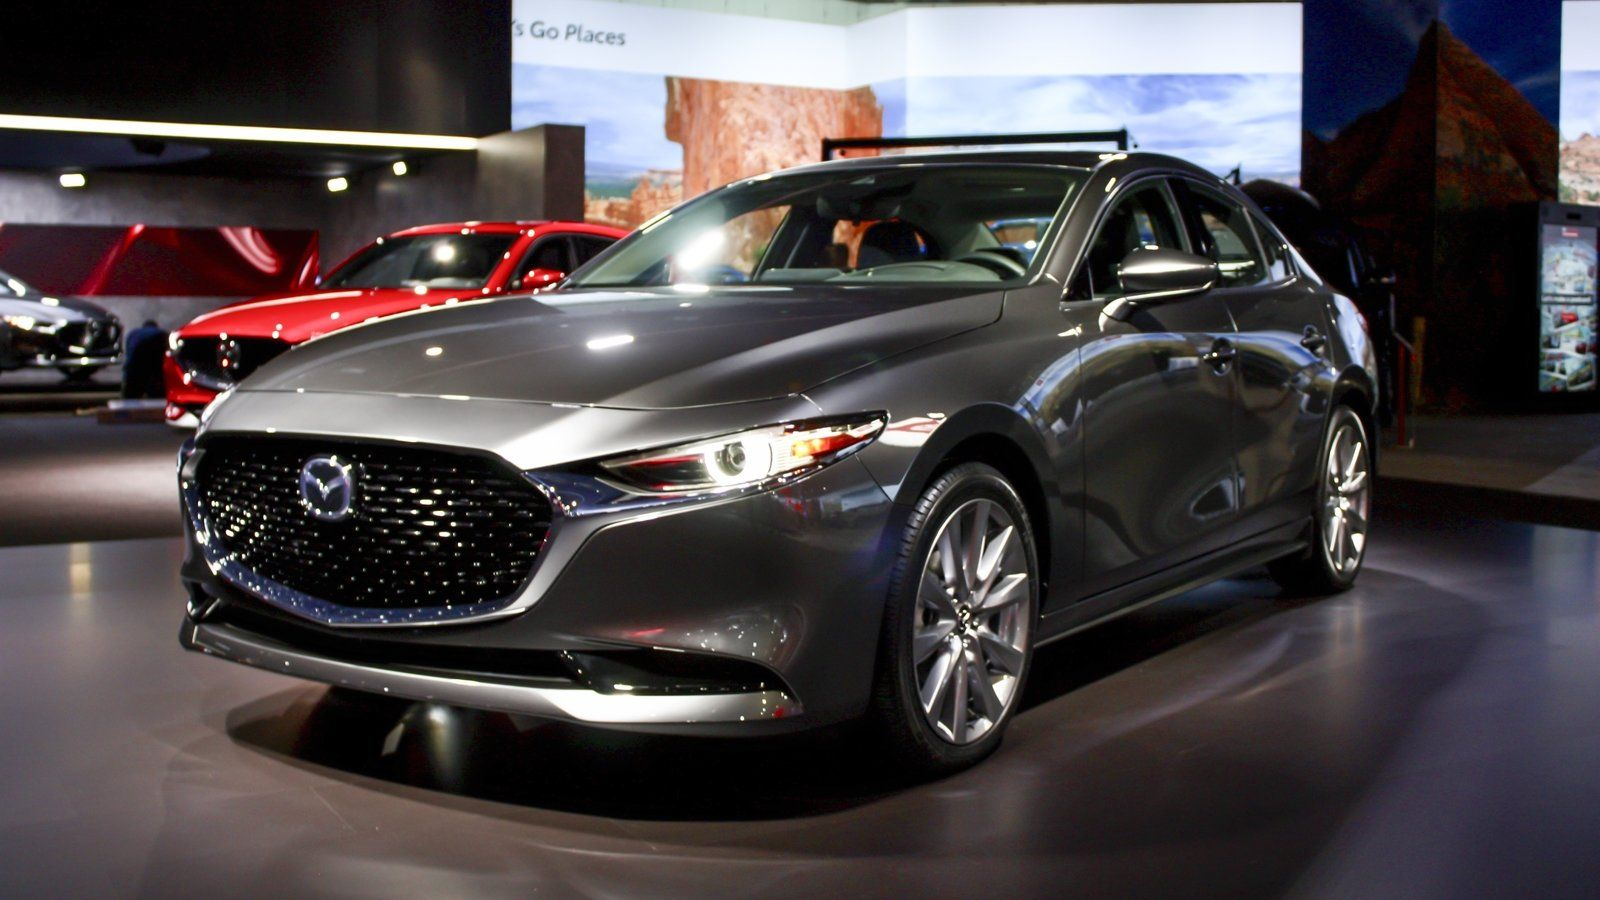 2019 Mazda 3 Sedan Mazda 3 sedan, Mazda cars, Mazda